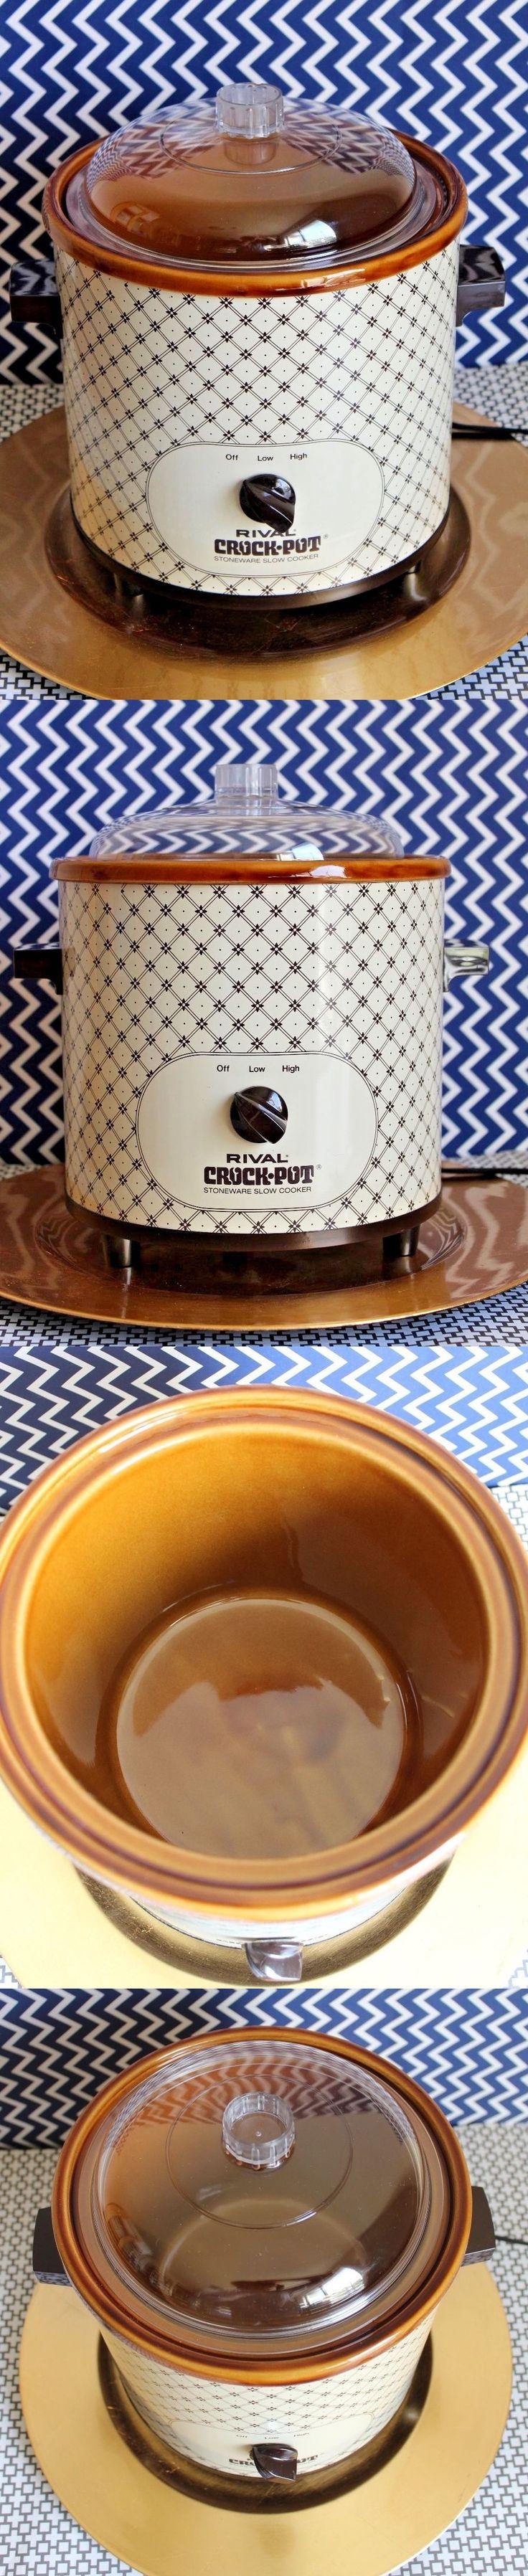 Vintage Small Appliances 116013: Vintage Rival Crock Pot Slow Cooker 3100P Brown Plaid W Original Recipe Booklet -> BUY IT NOW ONLY: $39.99 on eBay!